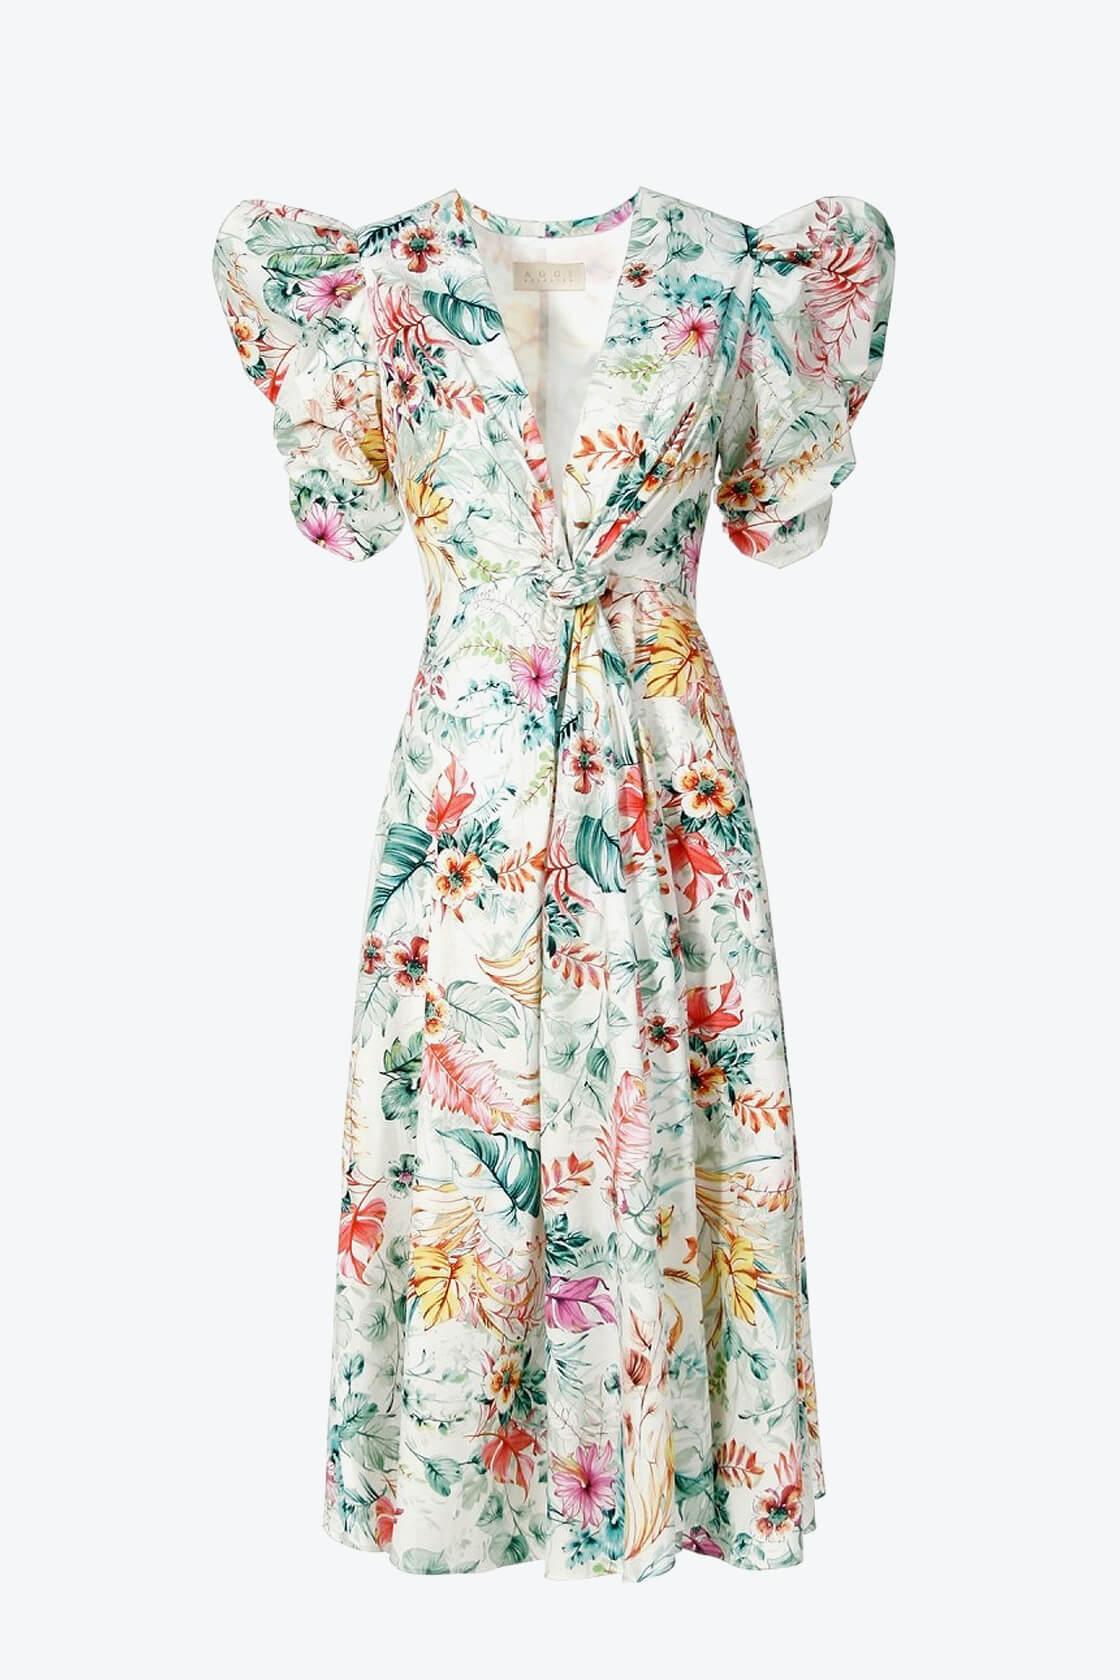 OL100002624 Dress Alta Spring Bud1